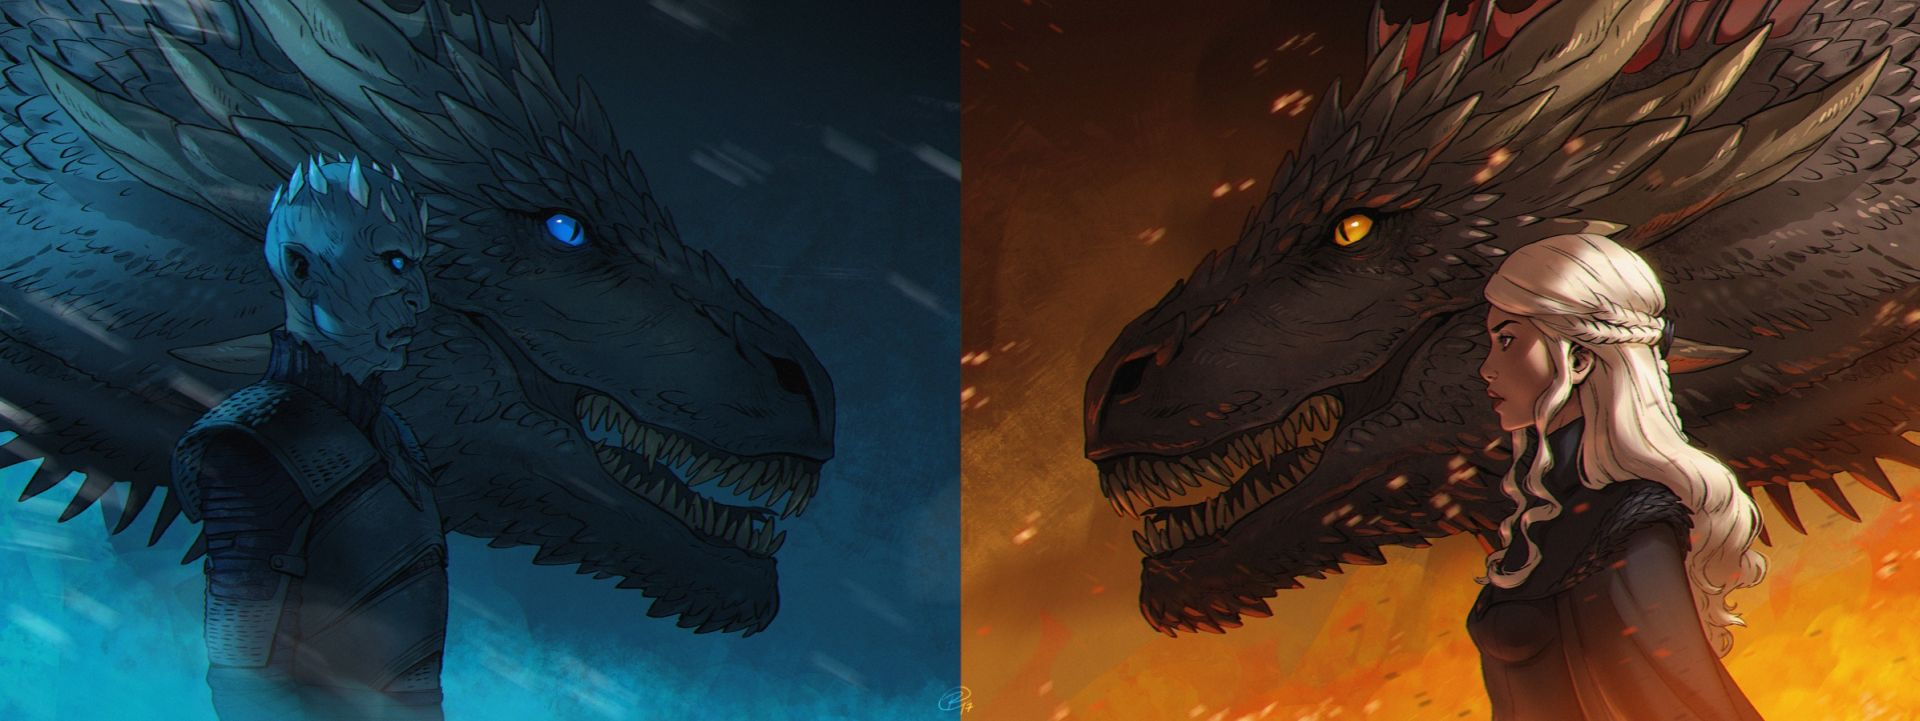 Game of Thrones Daenerys and White Walker fan art